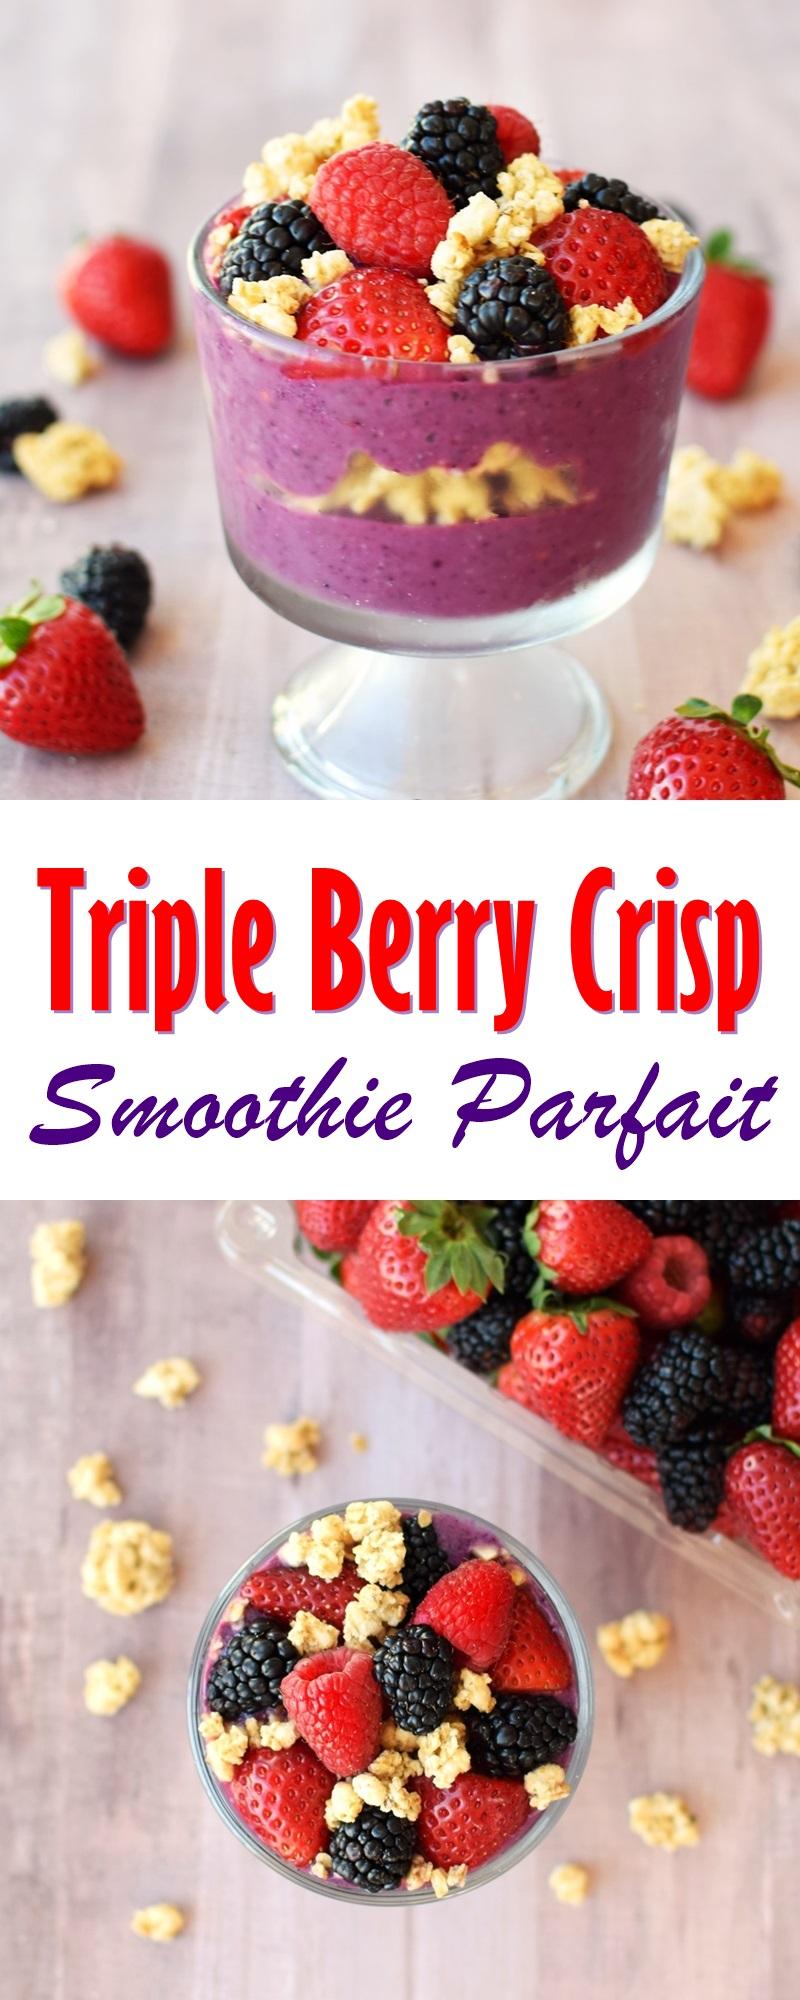 Triple Berry Crisp Smoothie Parfait Recipe - plant-based, dairy-free, single serve